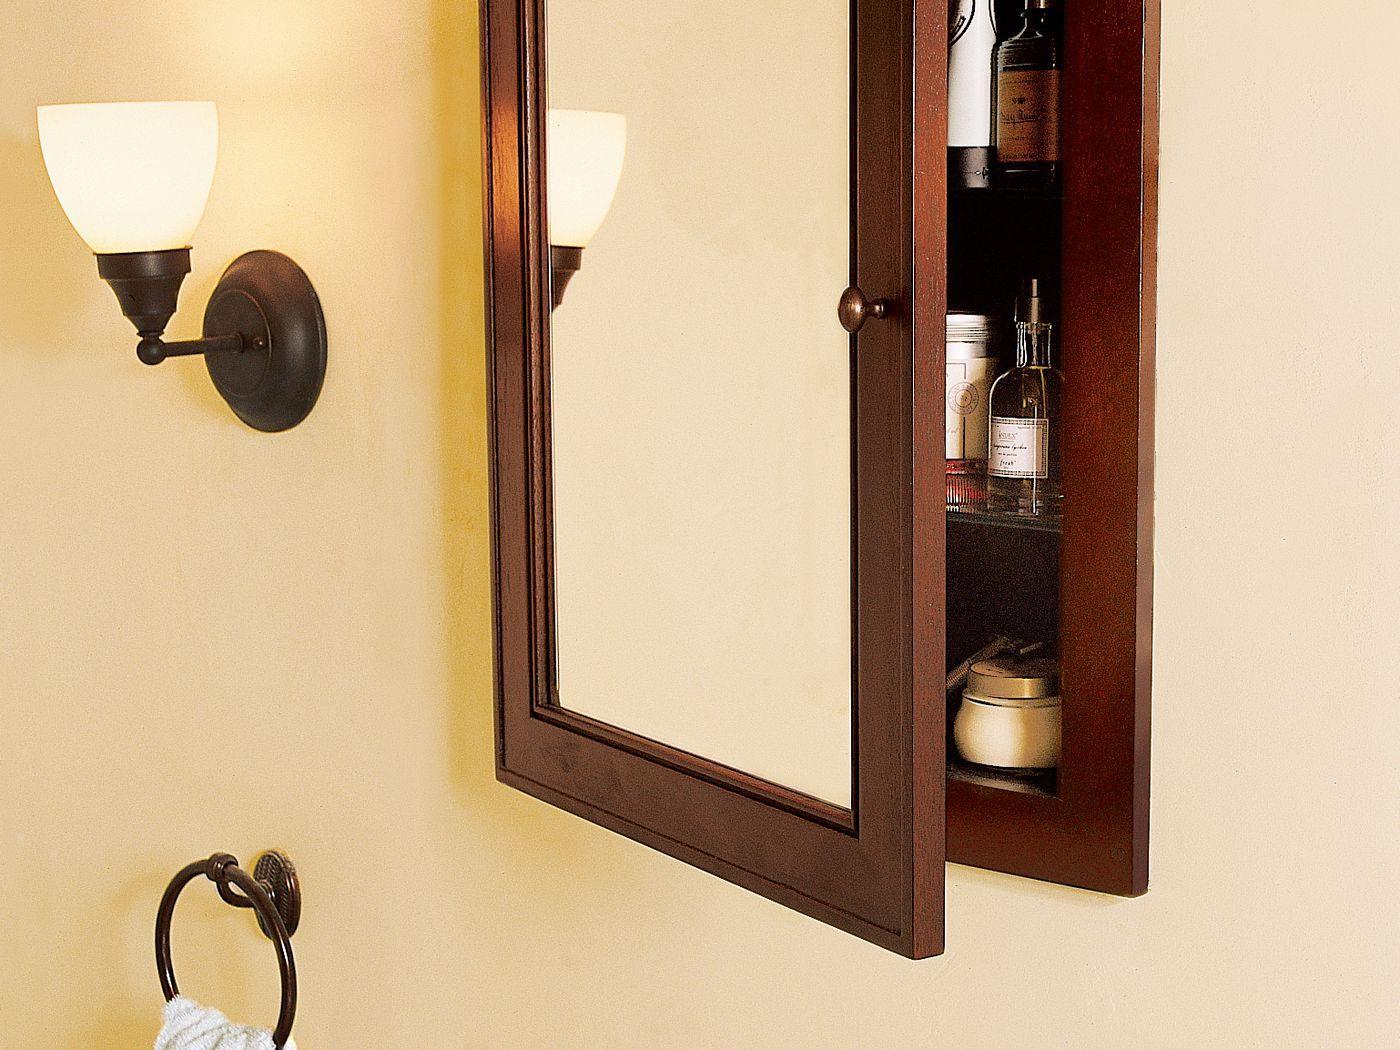 How To Install A Medicine Cabinet Medicine Cabinet Organization